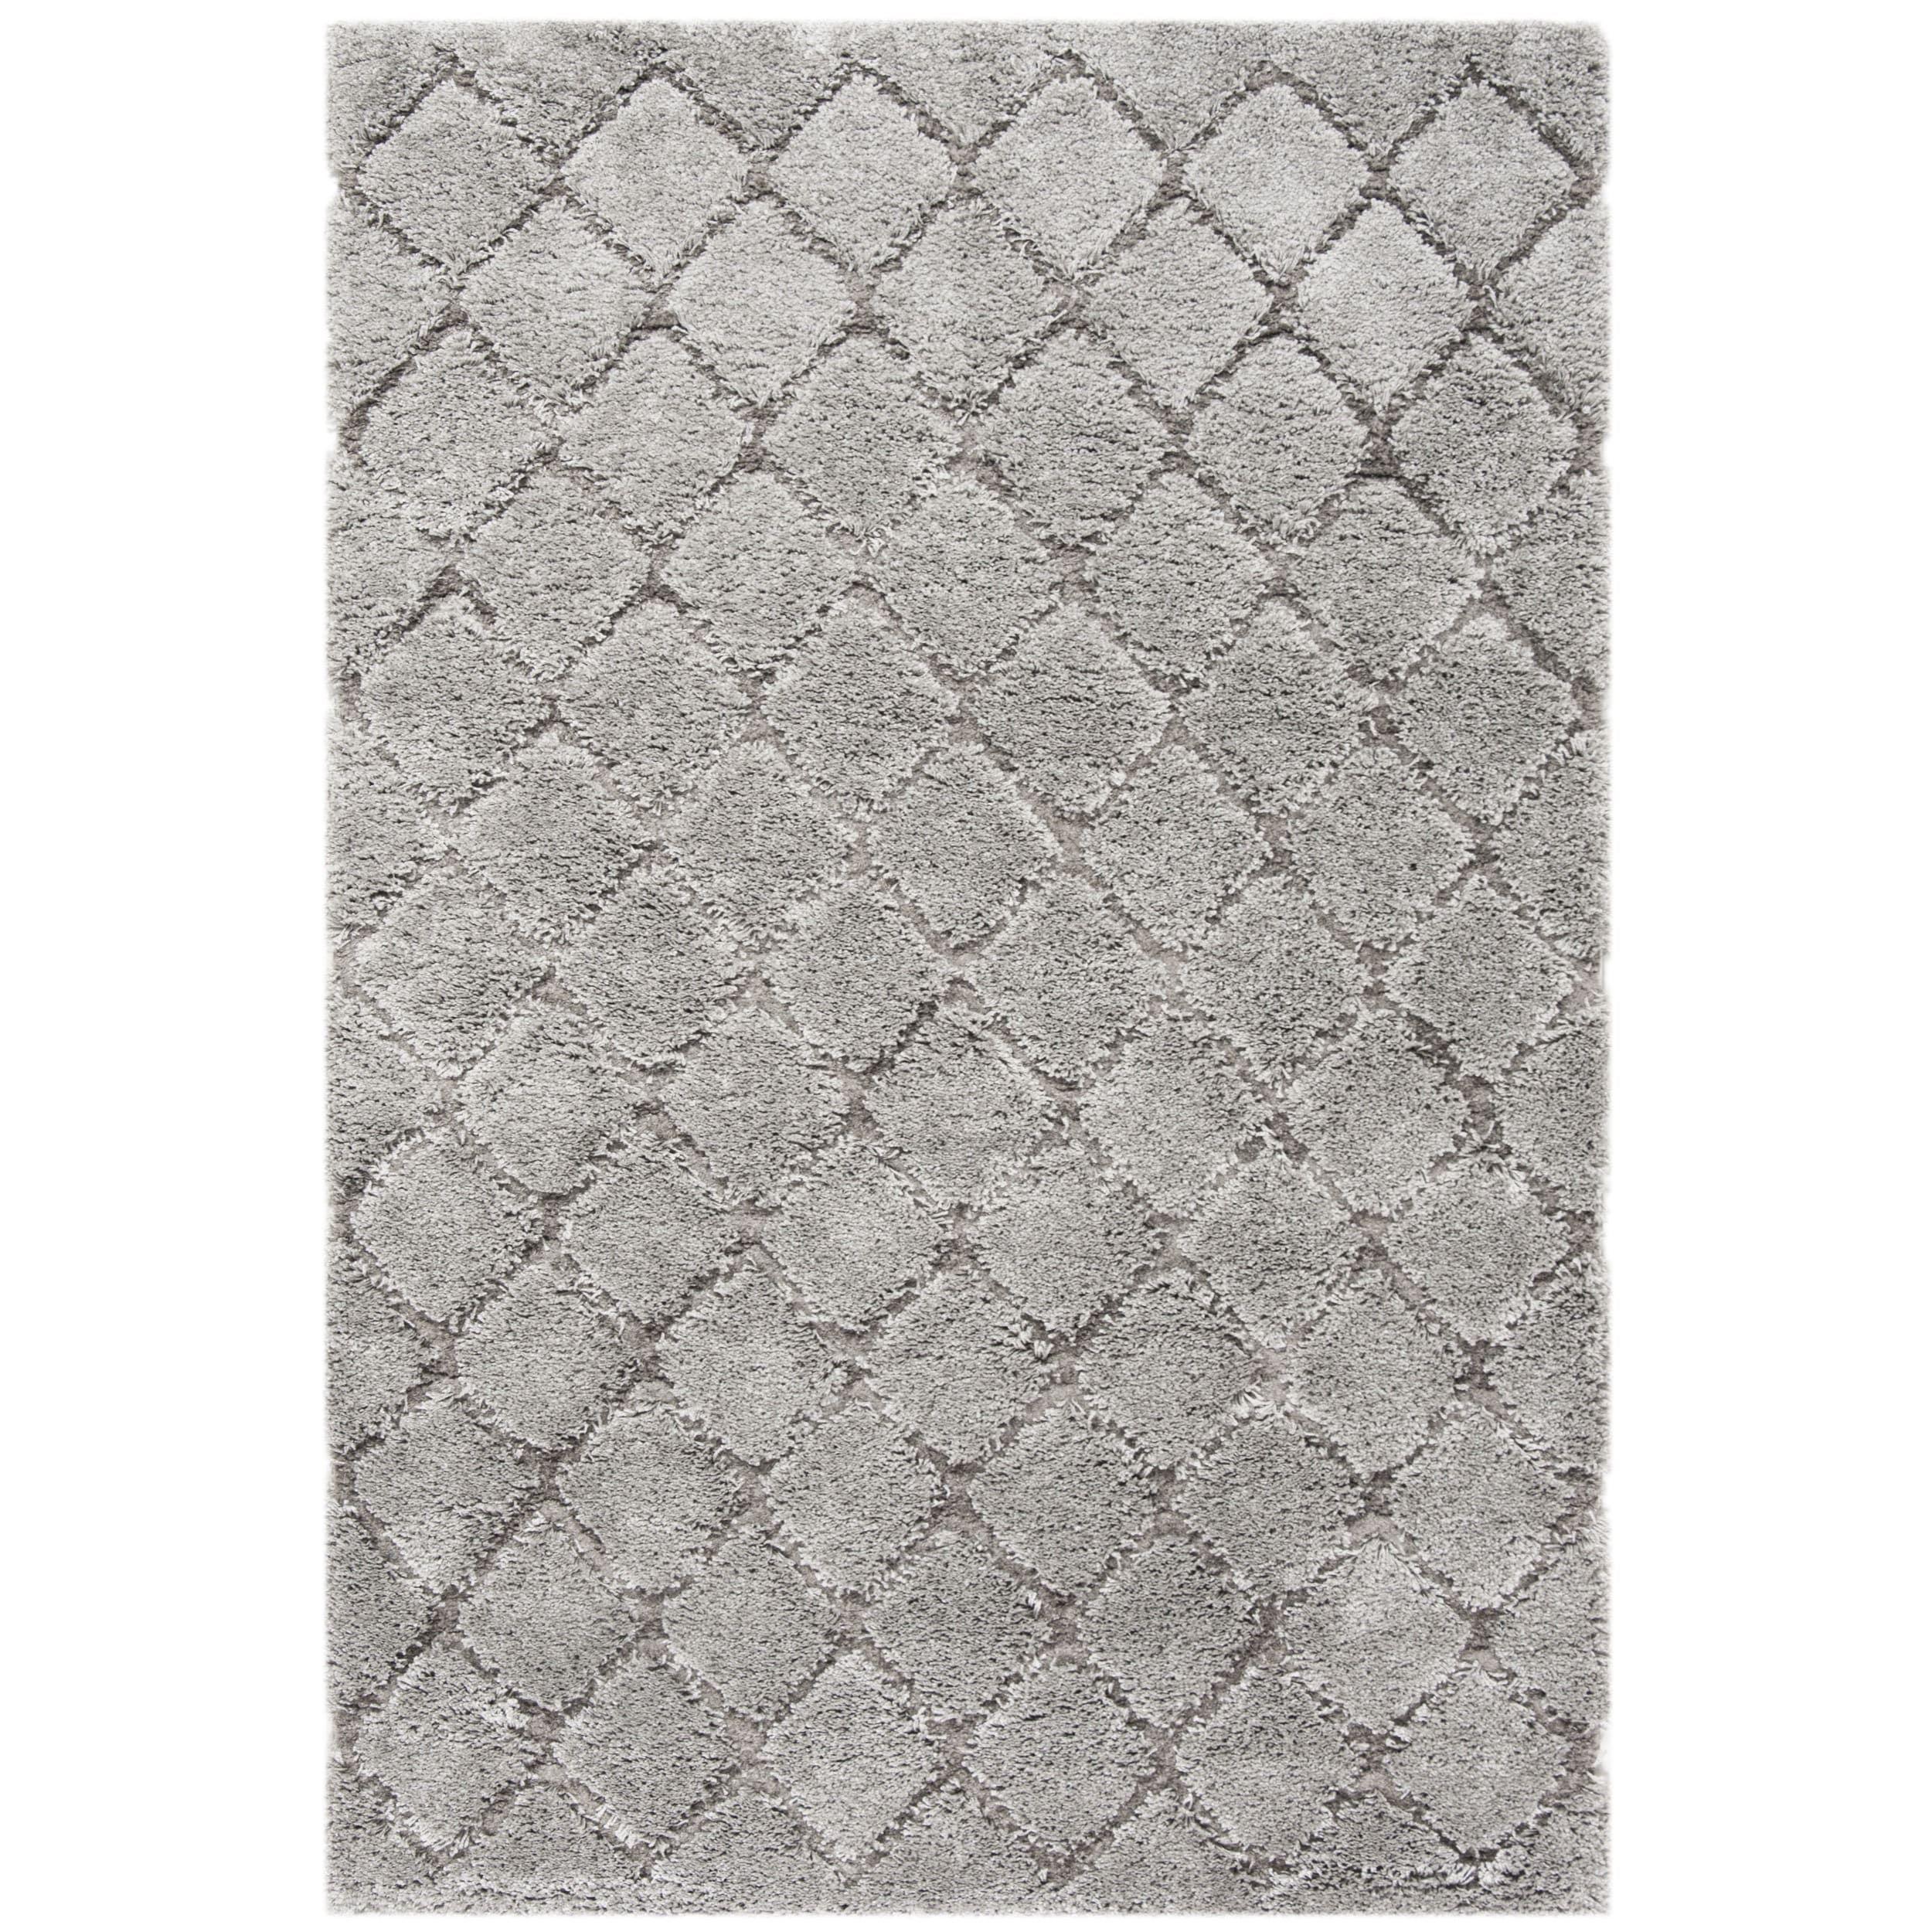 Safavieh Adriana Shag Light Grey/ Light Grey Polyester Rug (5'1 x 7'6) (ARG780B-5)